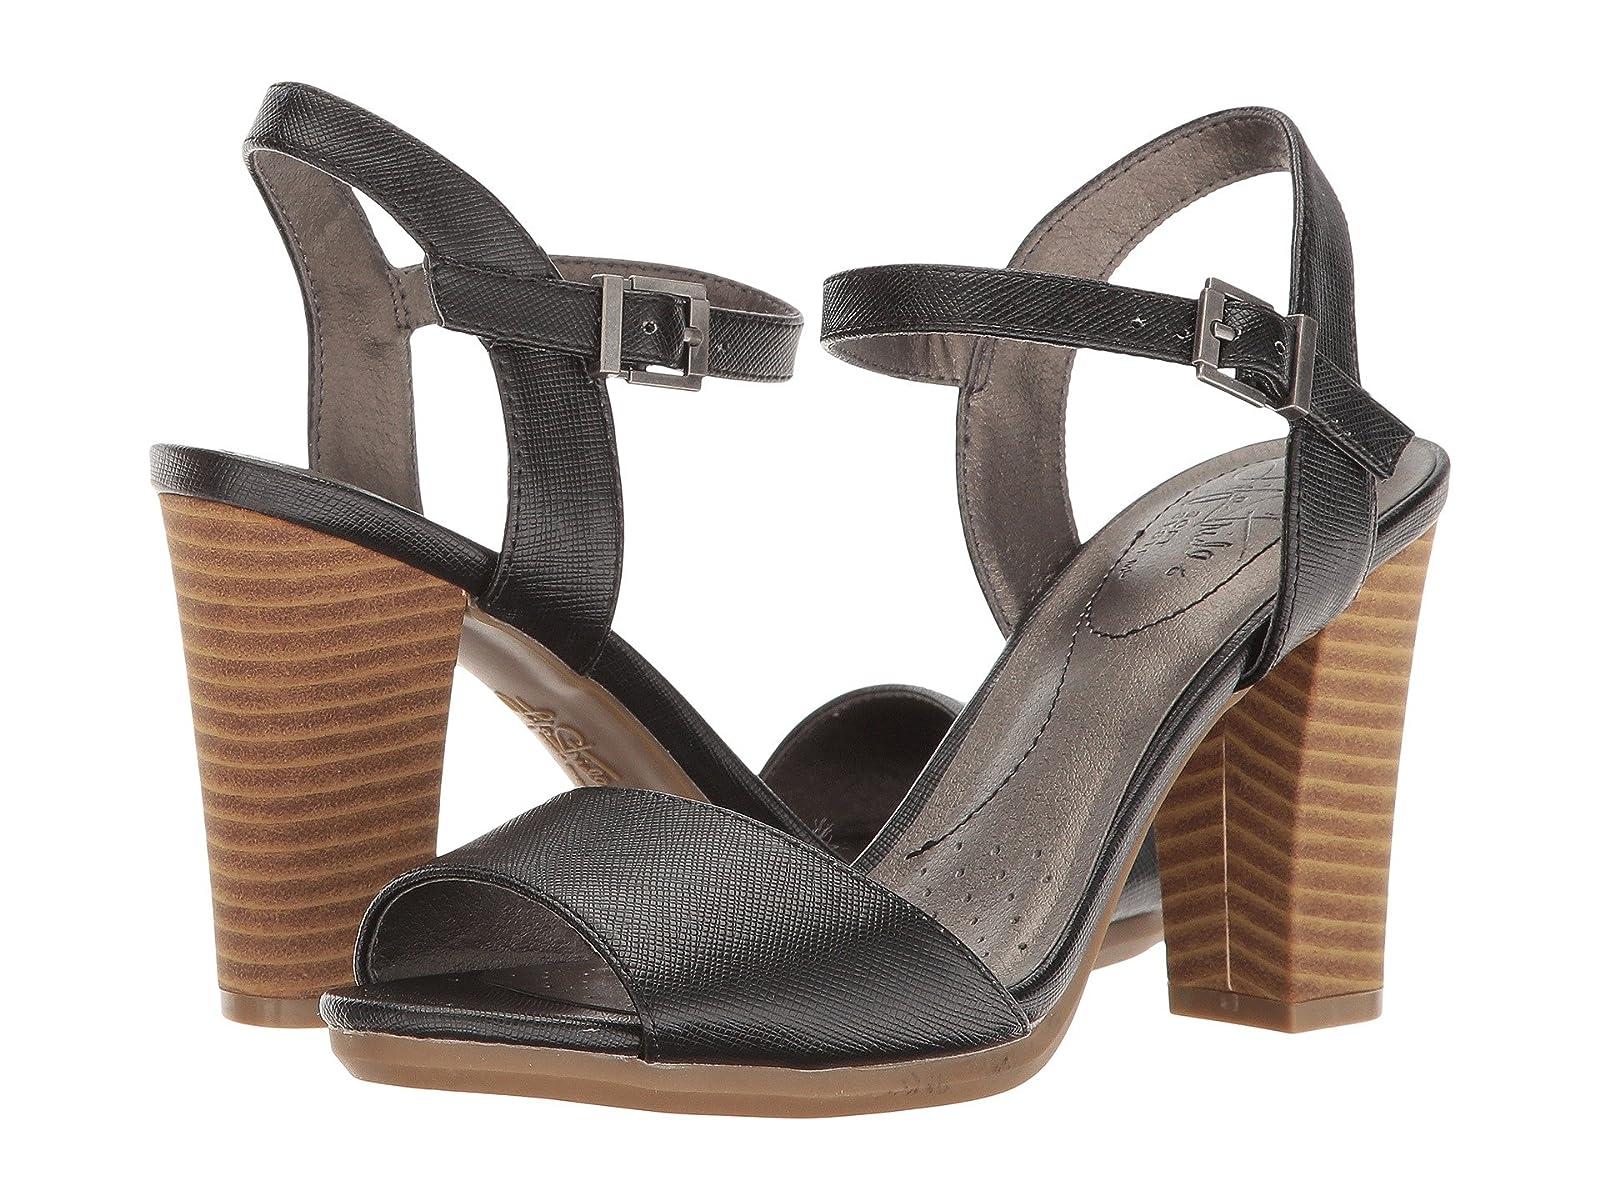 LifeStride NavinaCheap and distinctive eye-catching shoes